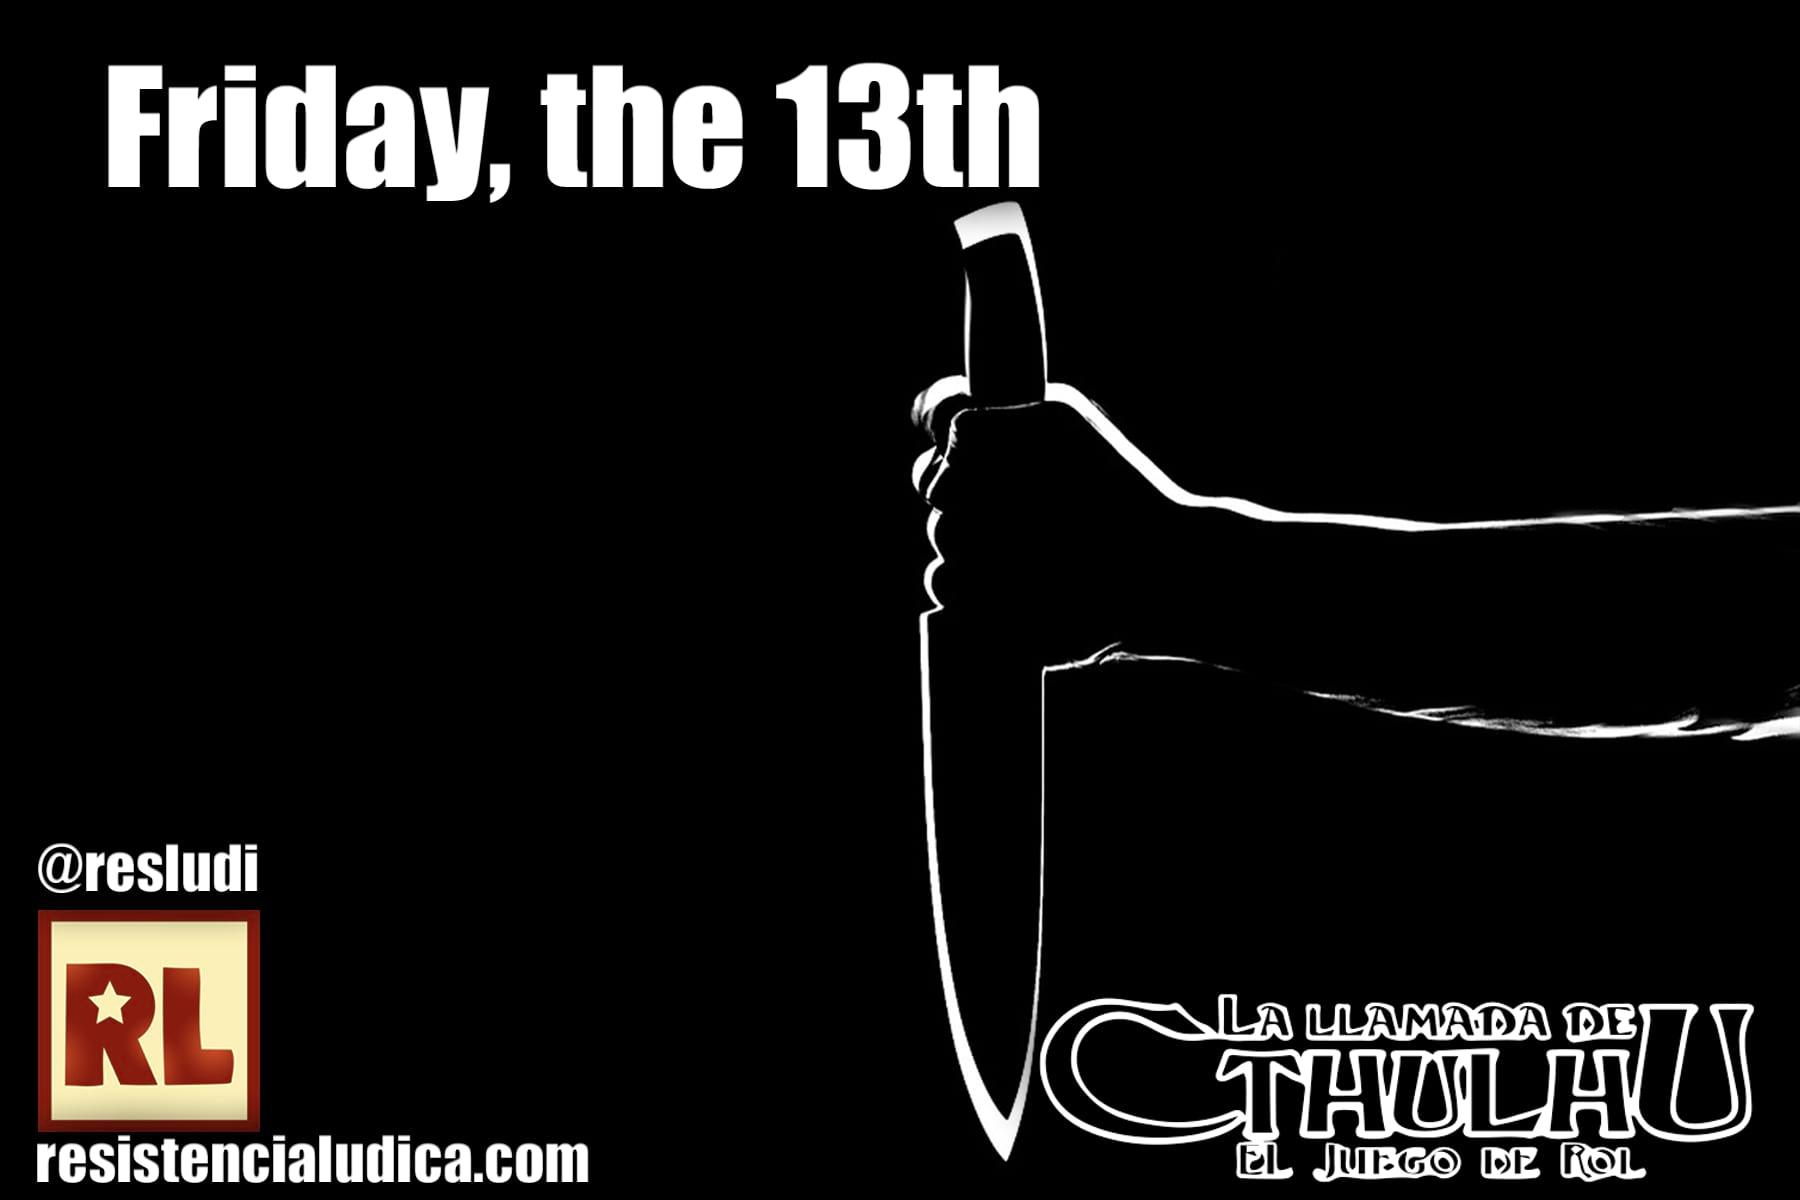 ✈ Friday, the 13th (La llamada de Cthulhu 7)